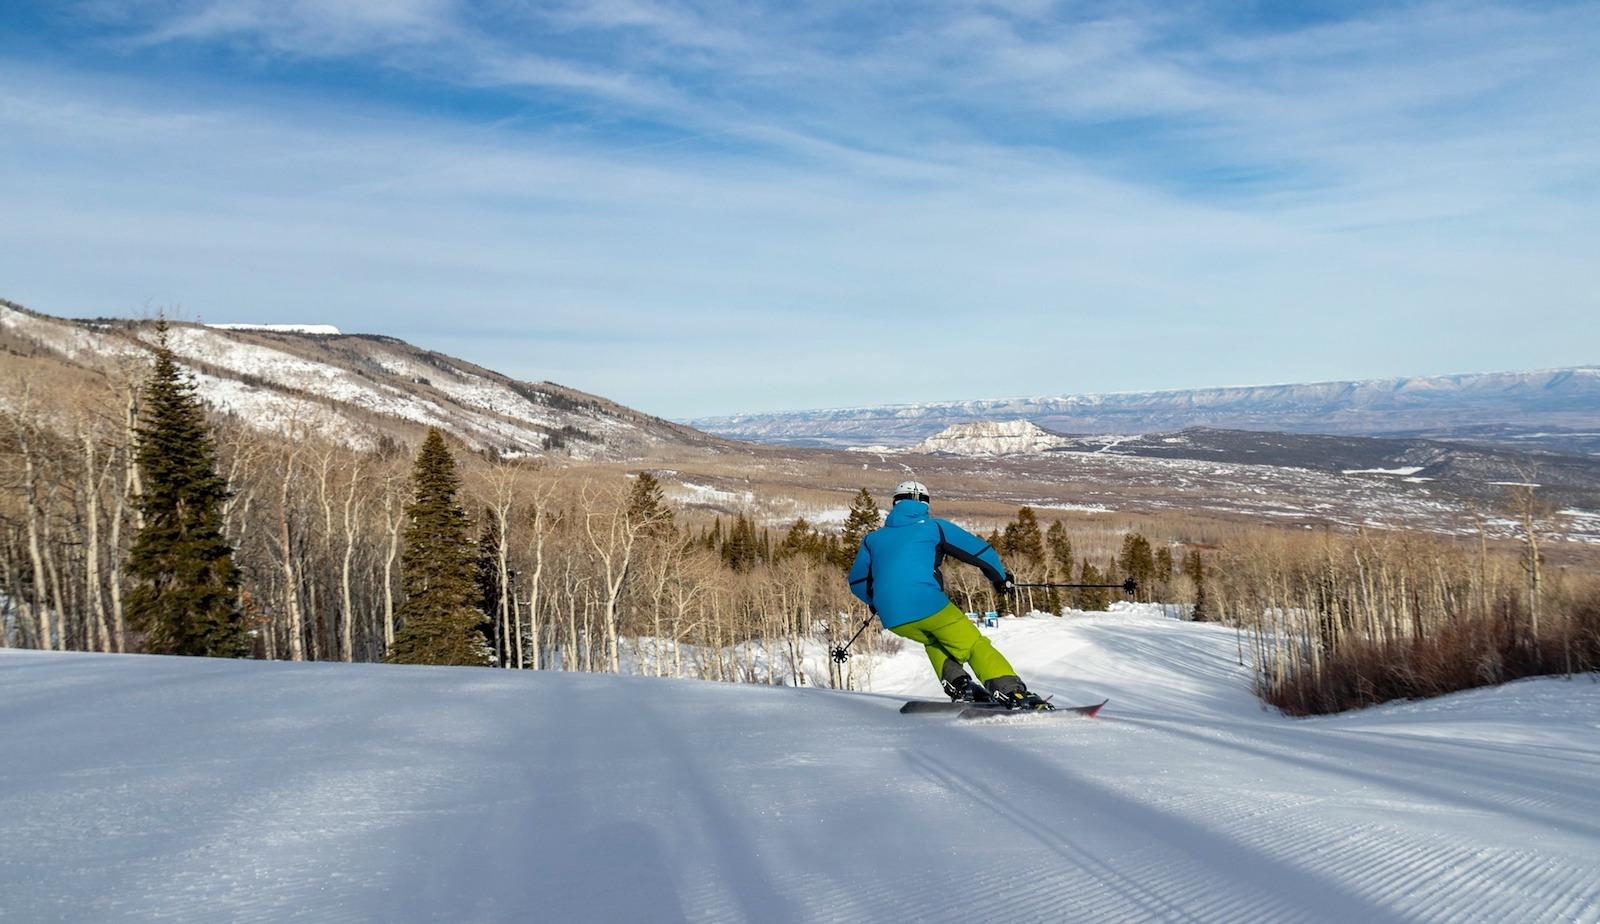 Image of a skier at Powderhorn Resort in Mesa, CO